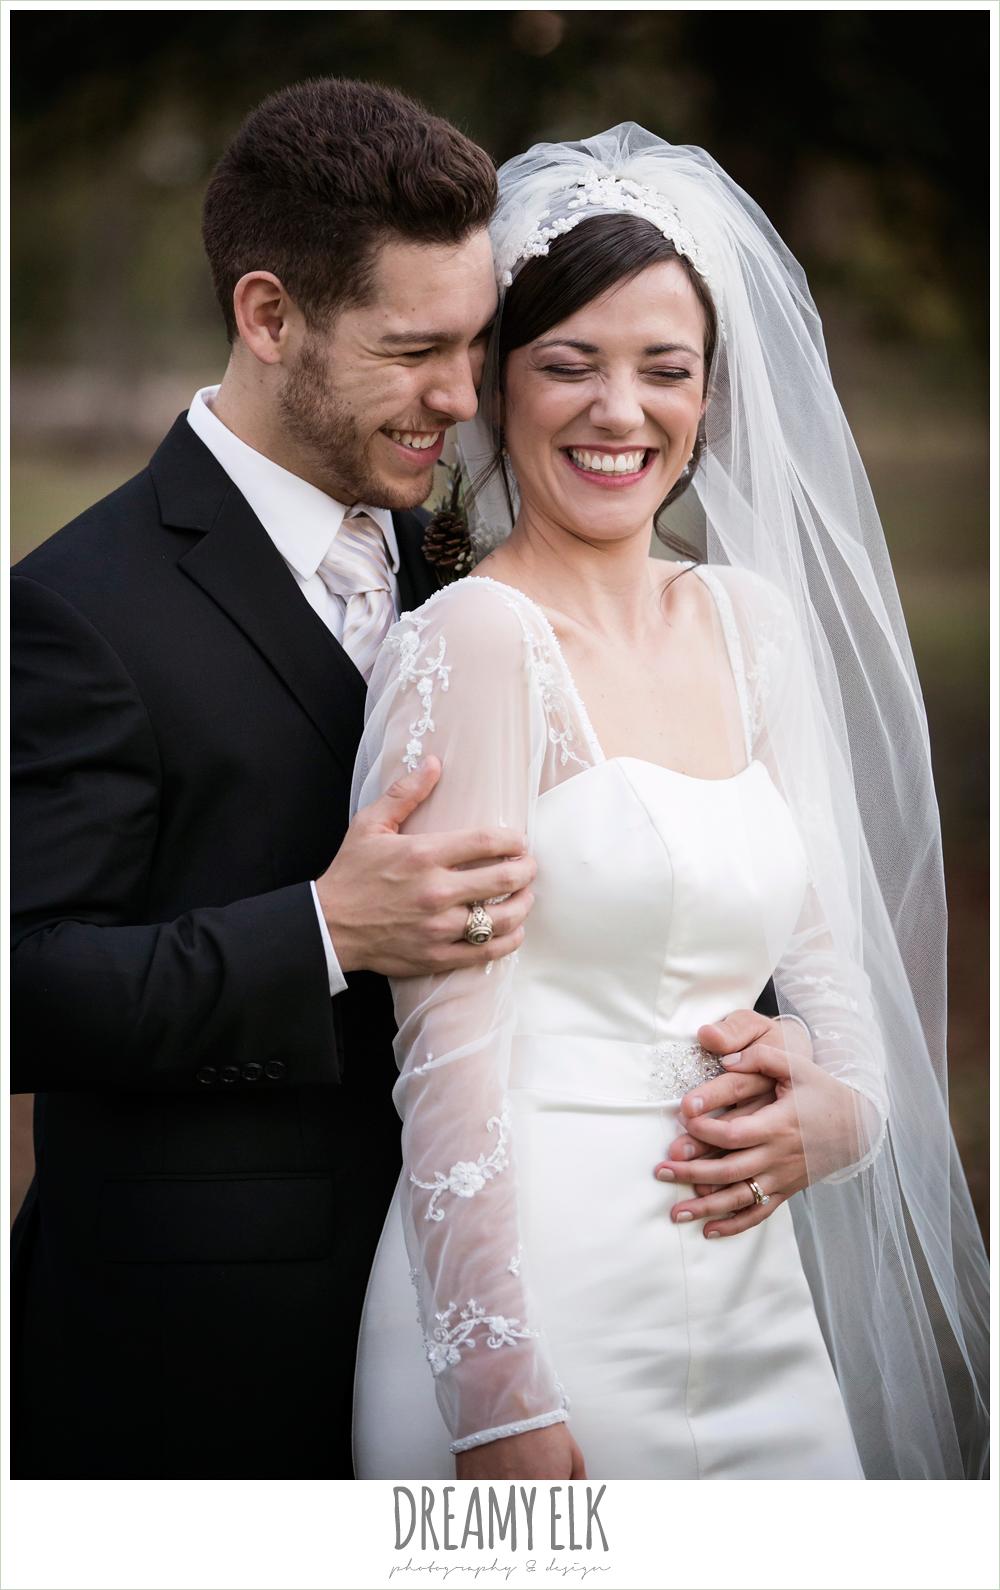 outdoor bride and groom portraits, long sleeve wedding dress, winter december church wedding photo {dreamy elk photography and design}